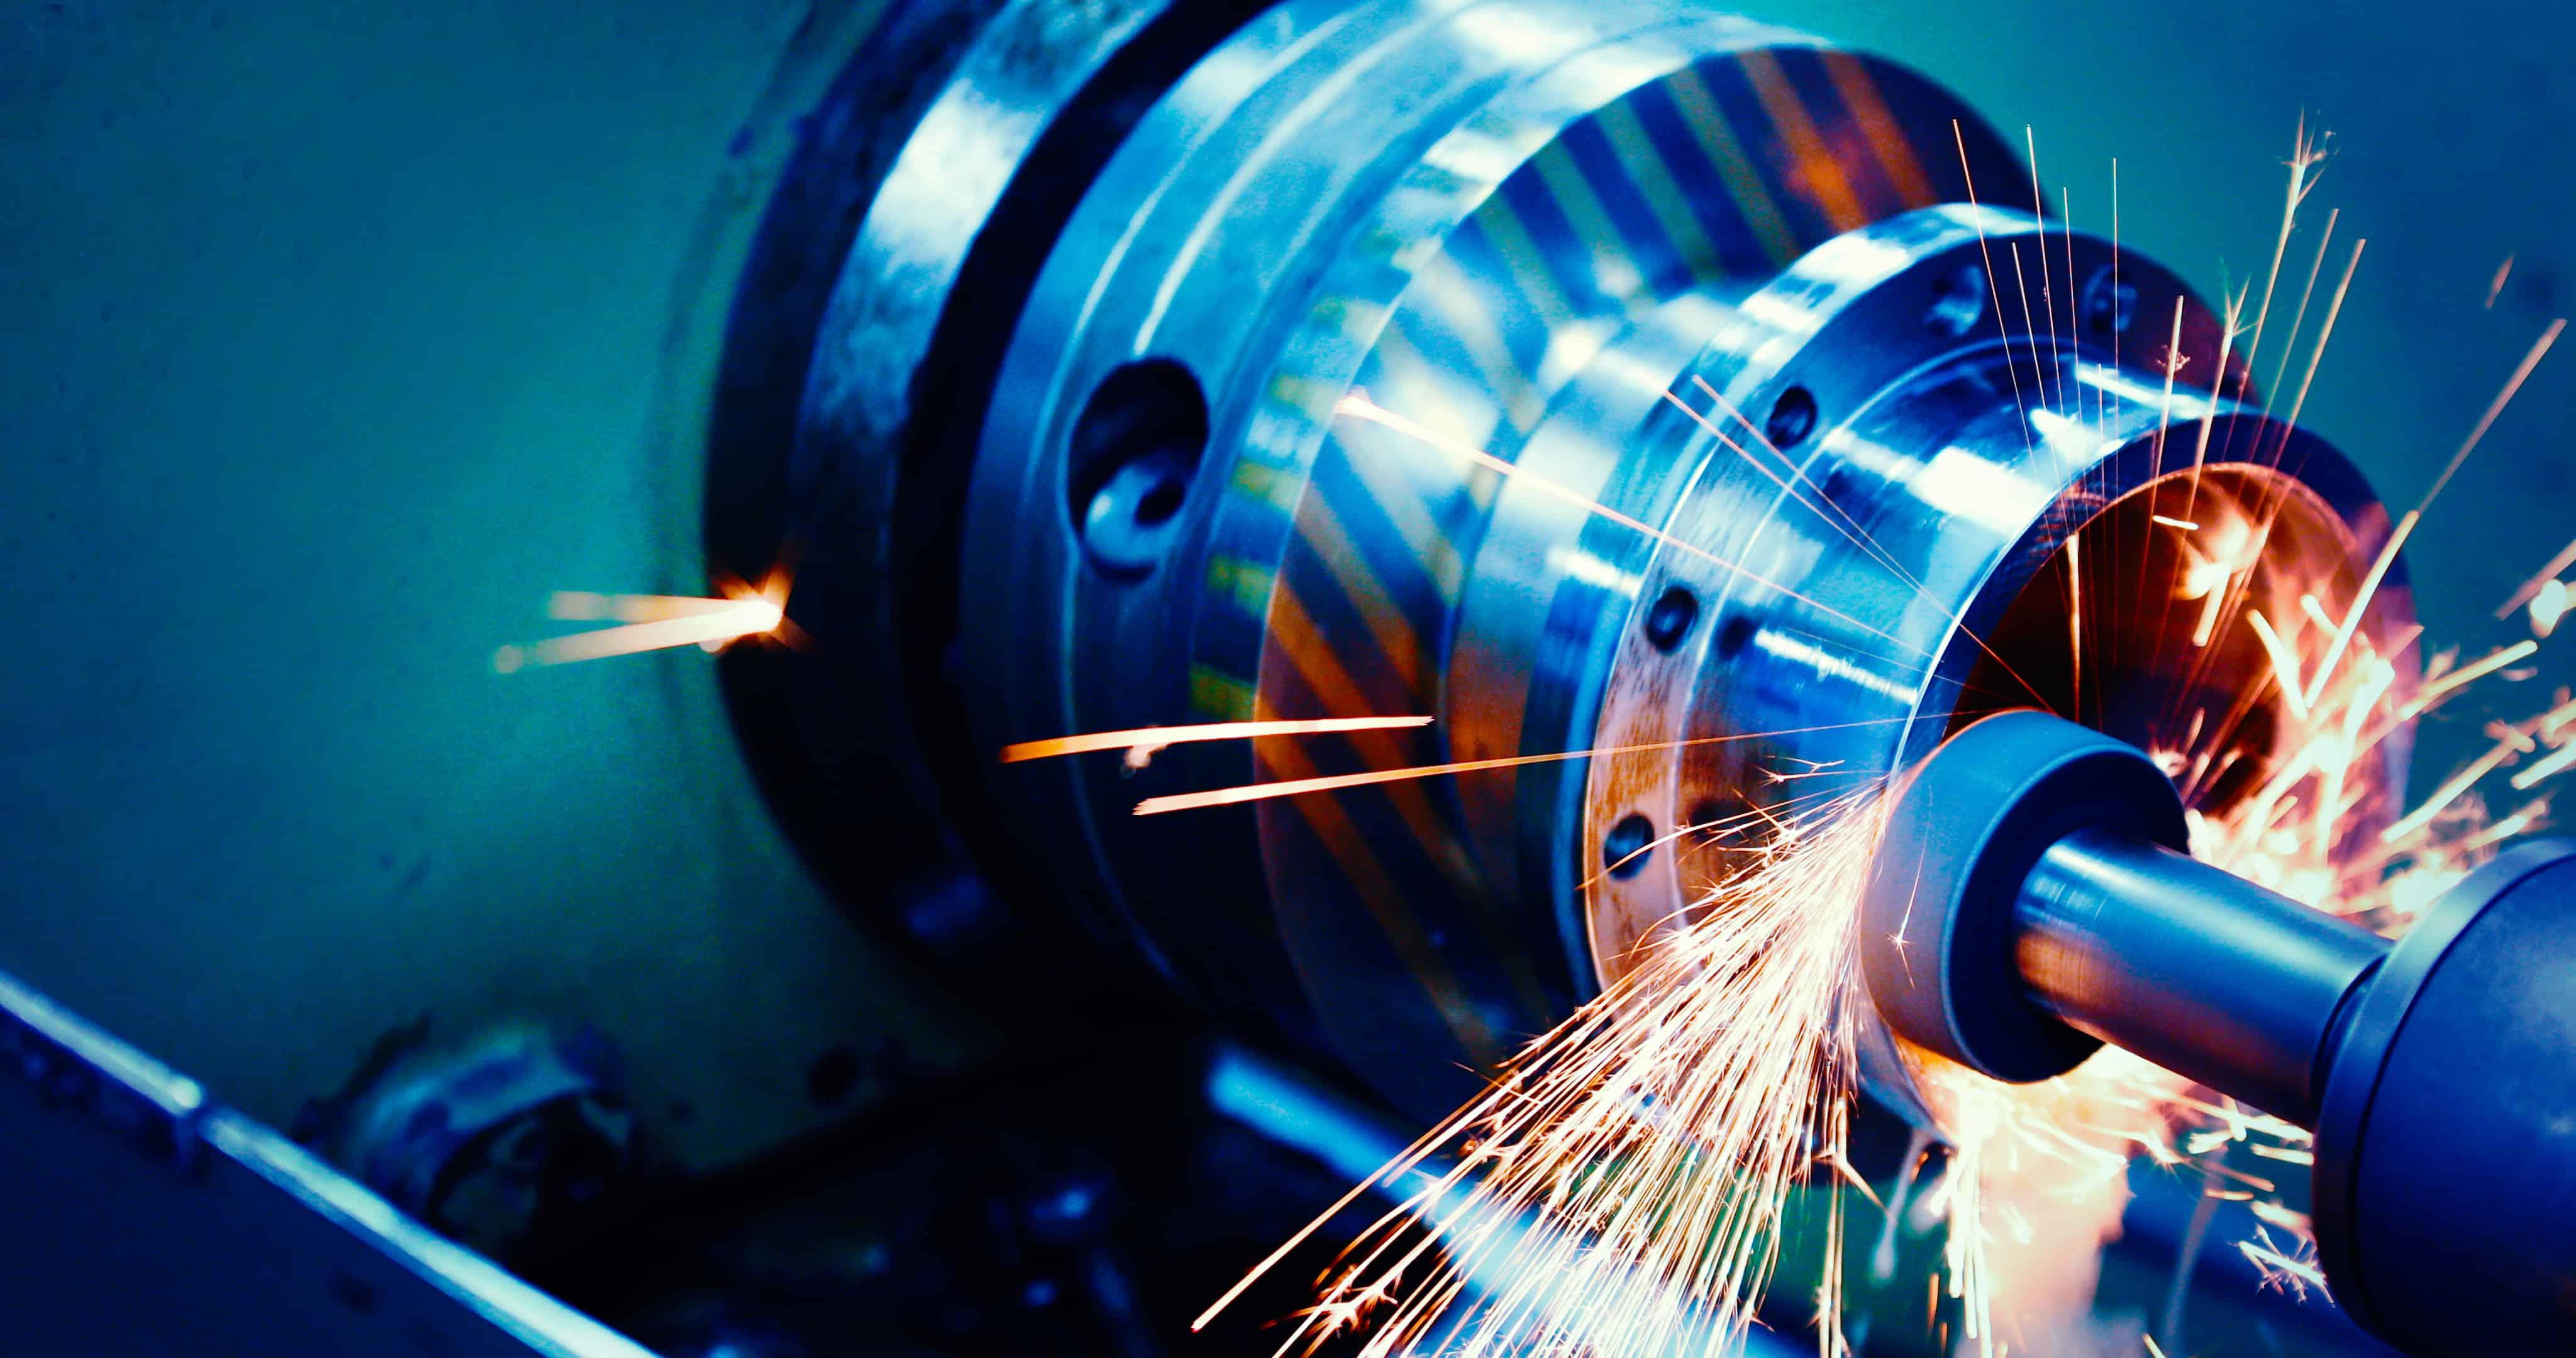 Metal Machining Job Shop and Machine Shop Manufacturing